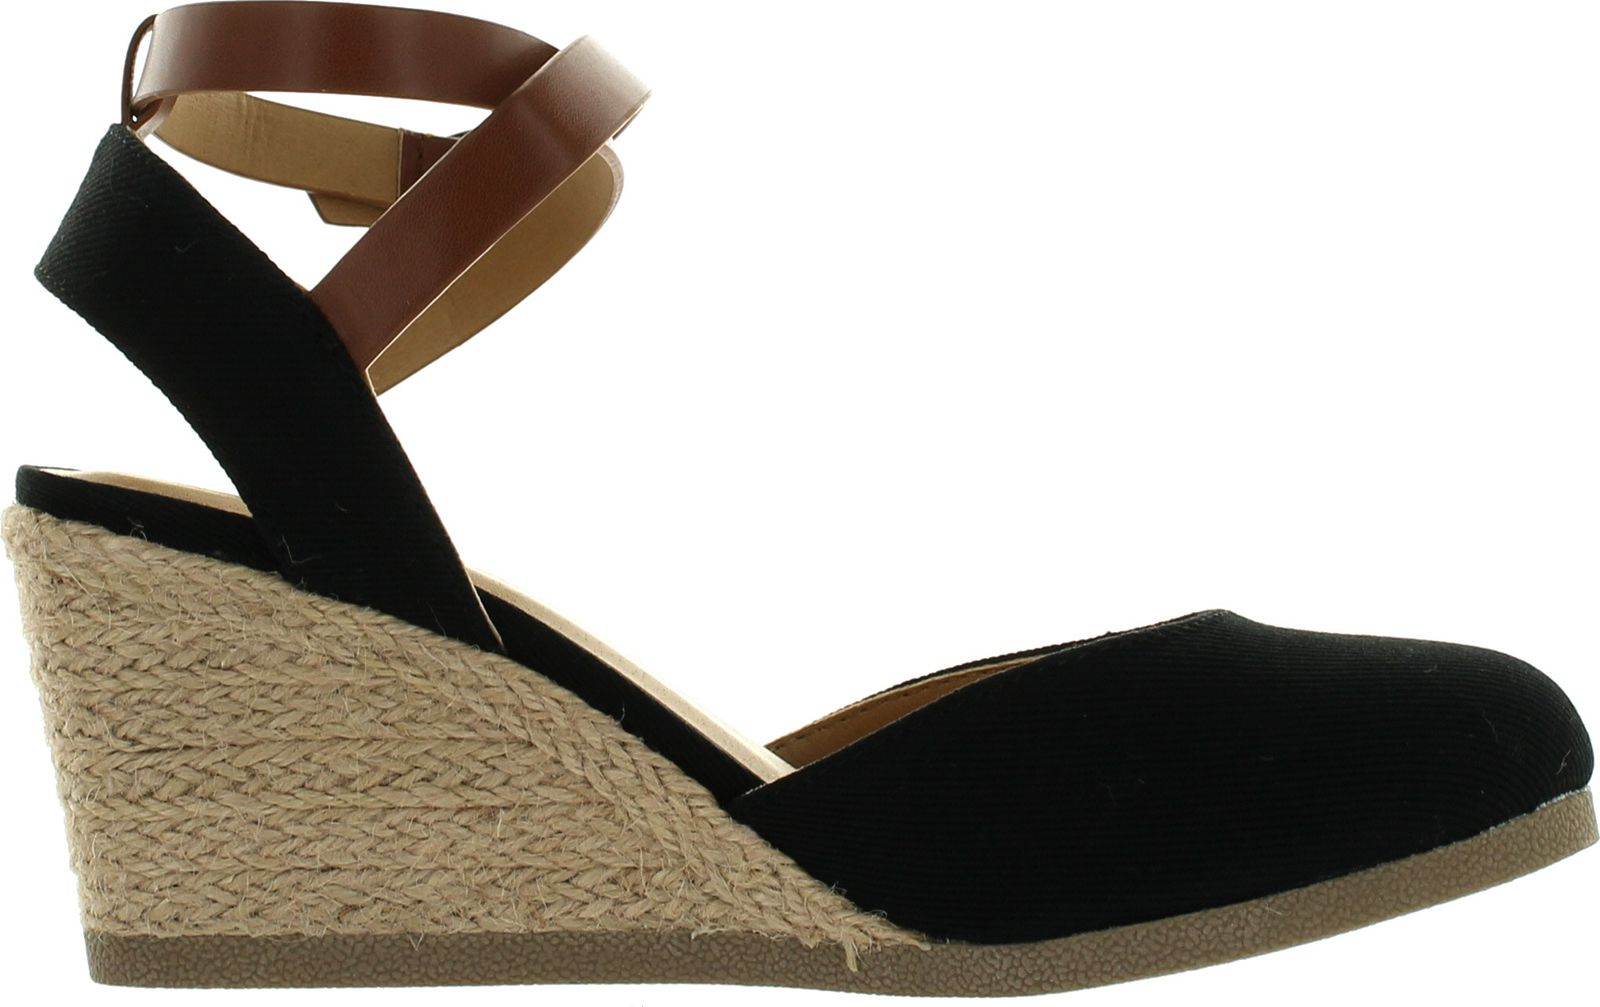 da5459c3ac7 Soda Womens Request Closed Toe Espadrille Wedge Sandal in Black Dark Tan  Linen